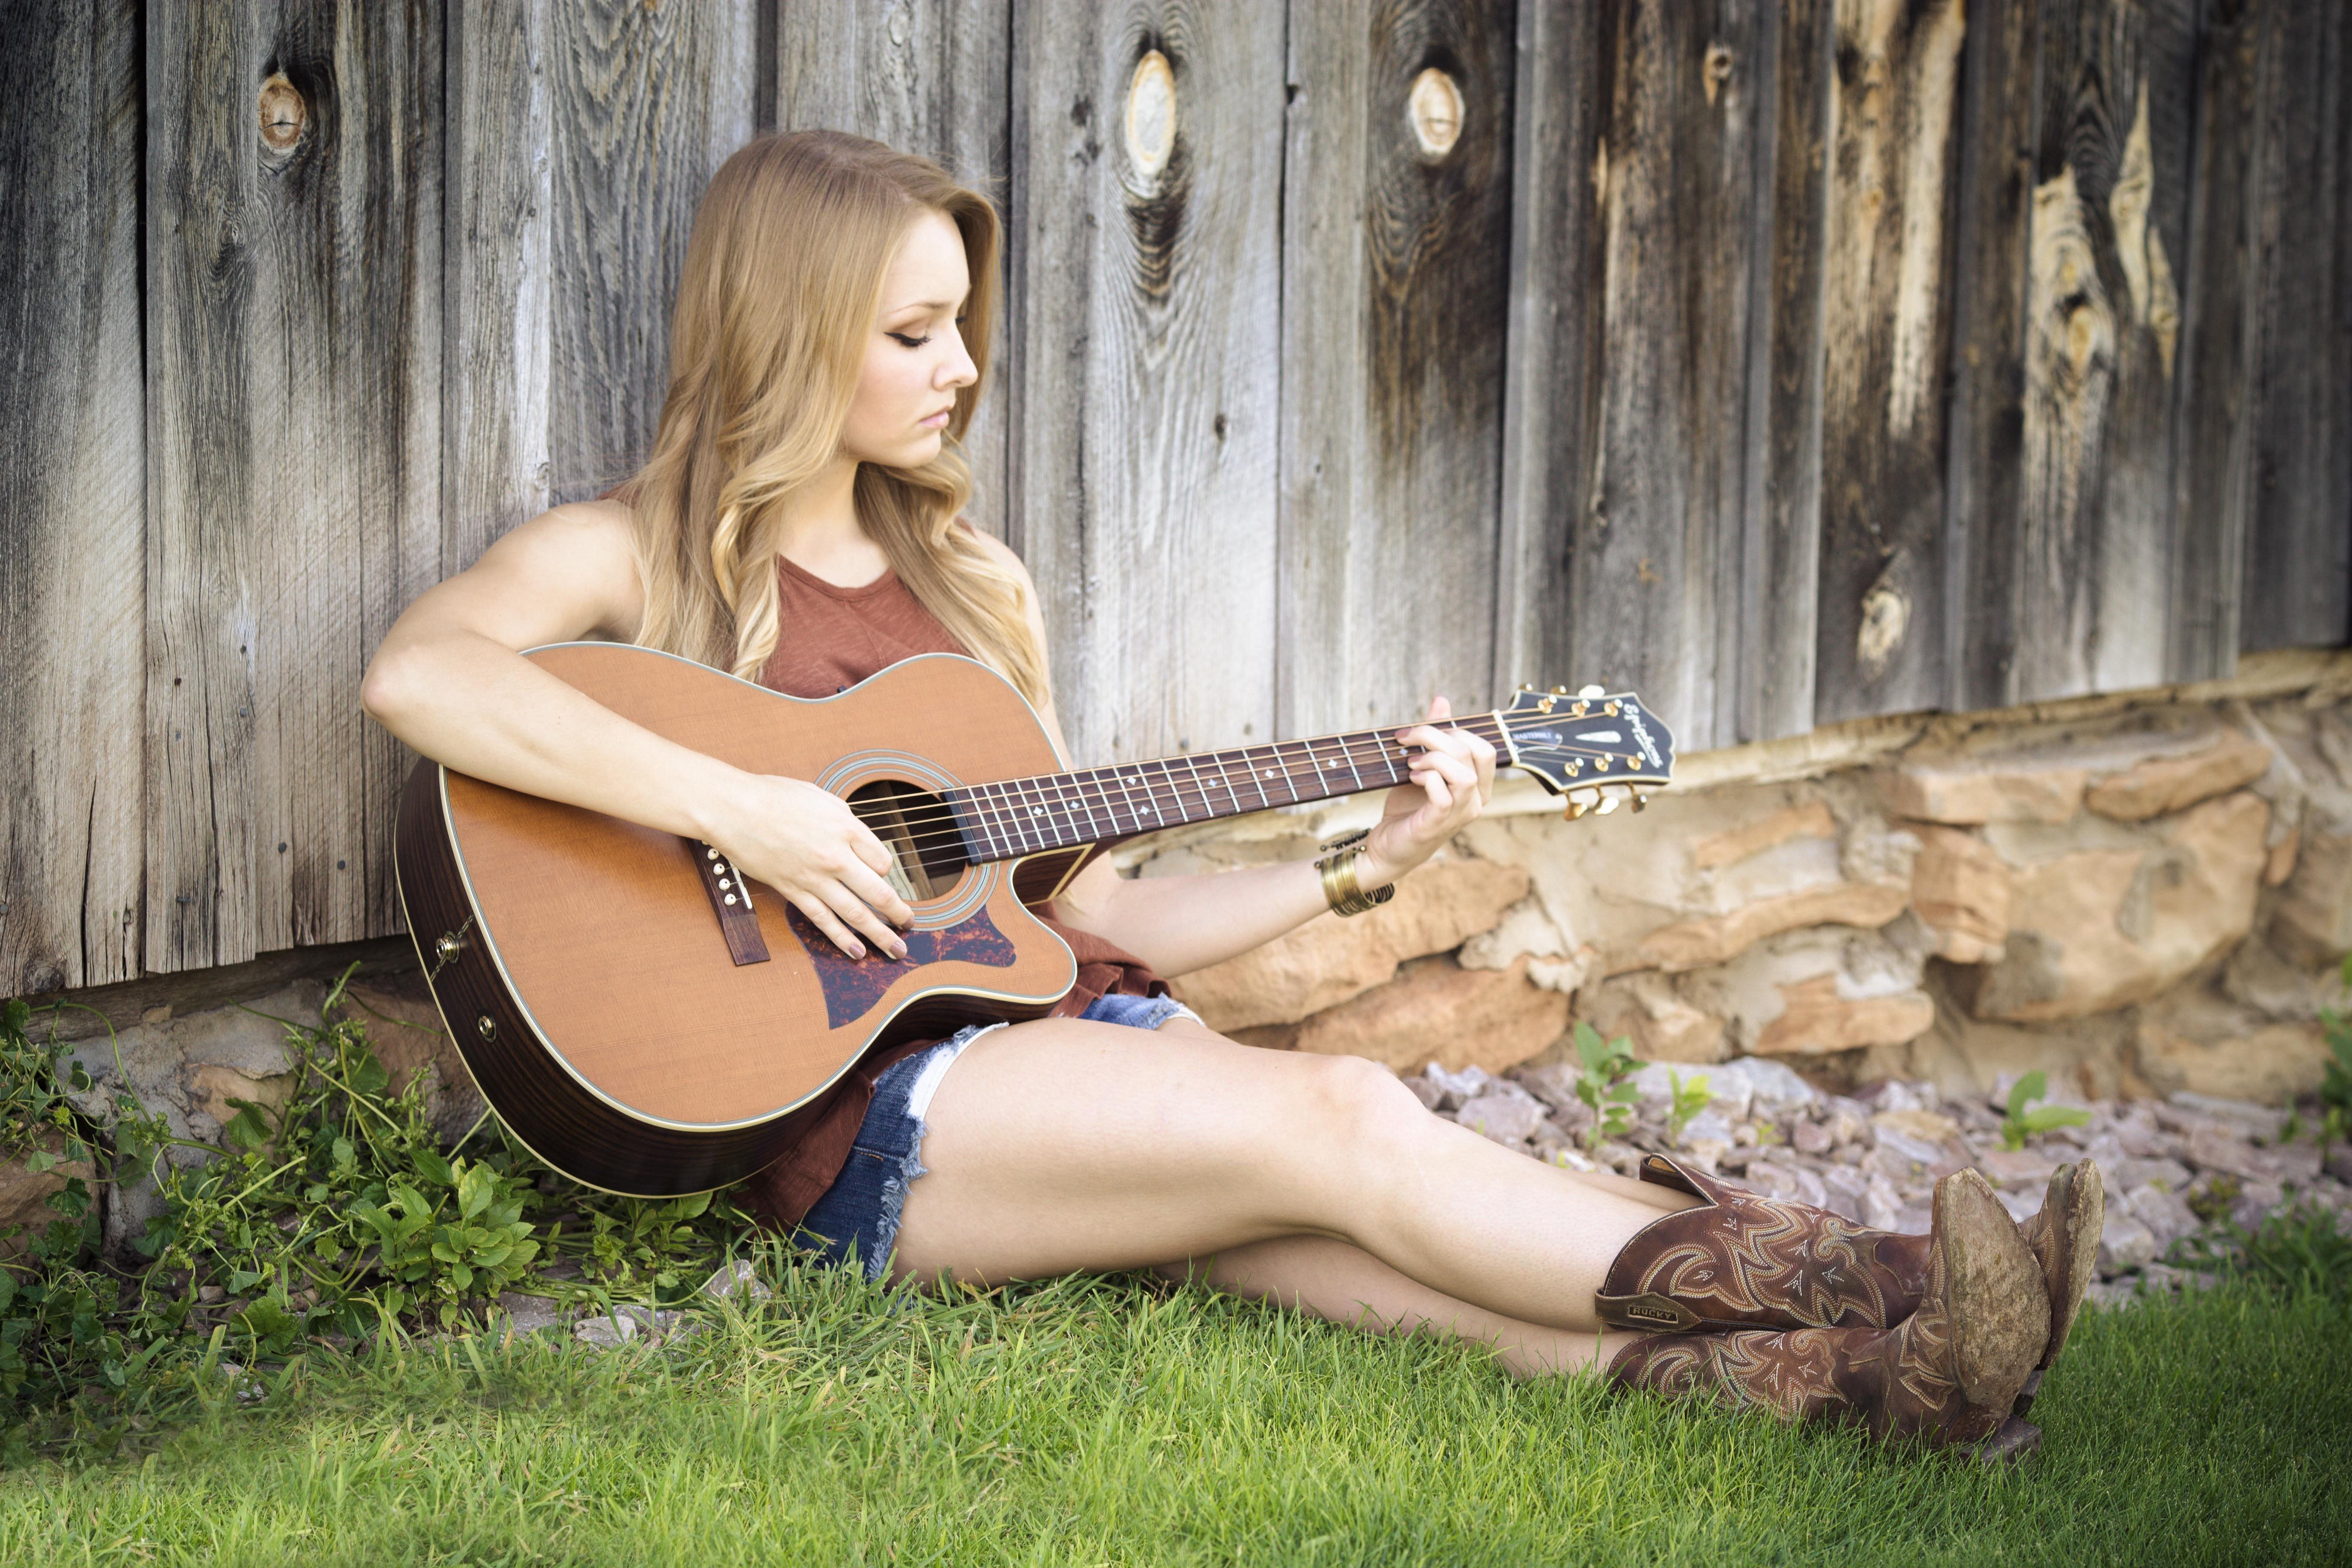 blonde girl songwriting